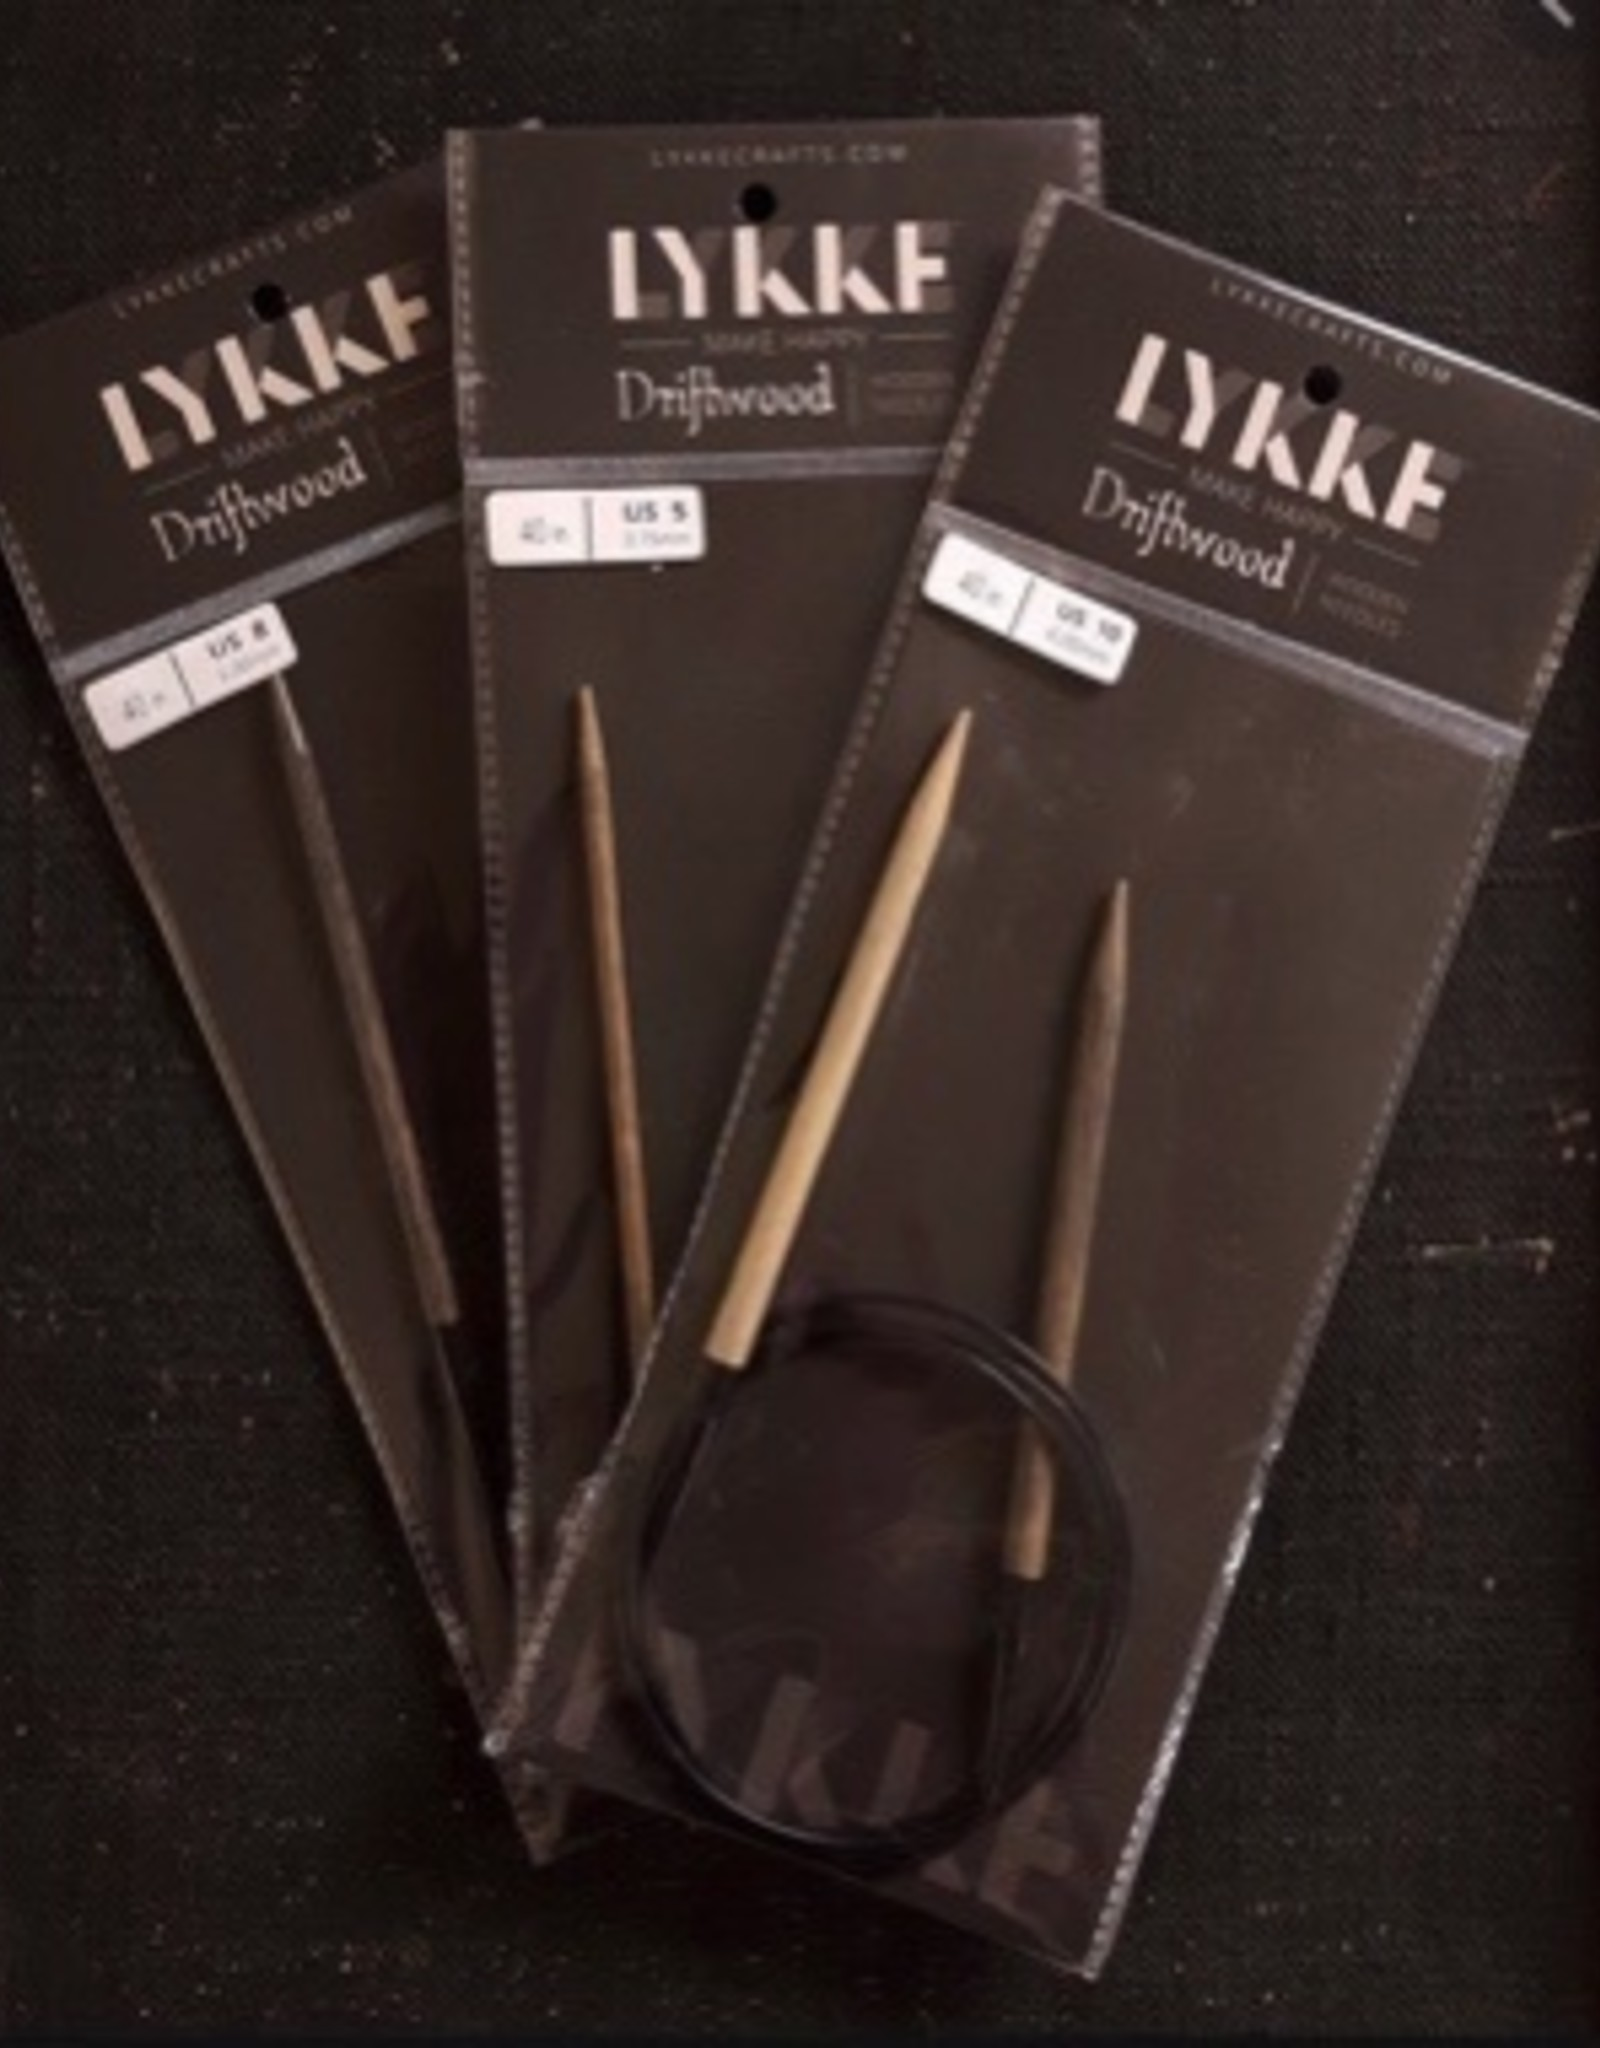 "Lykke Lykke Driftwood 16"" Circular Needles"